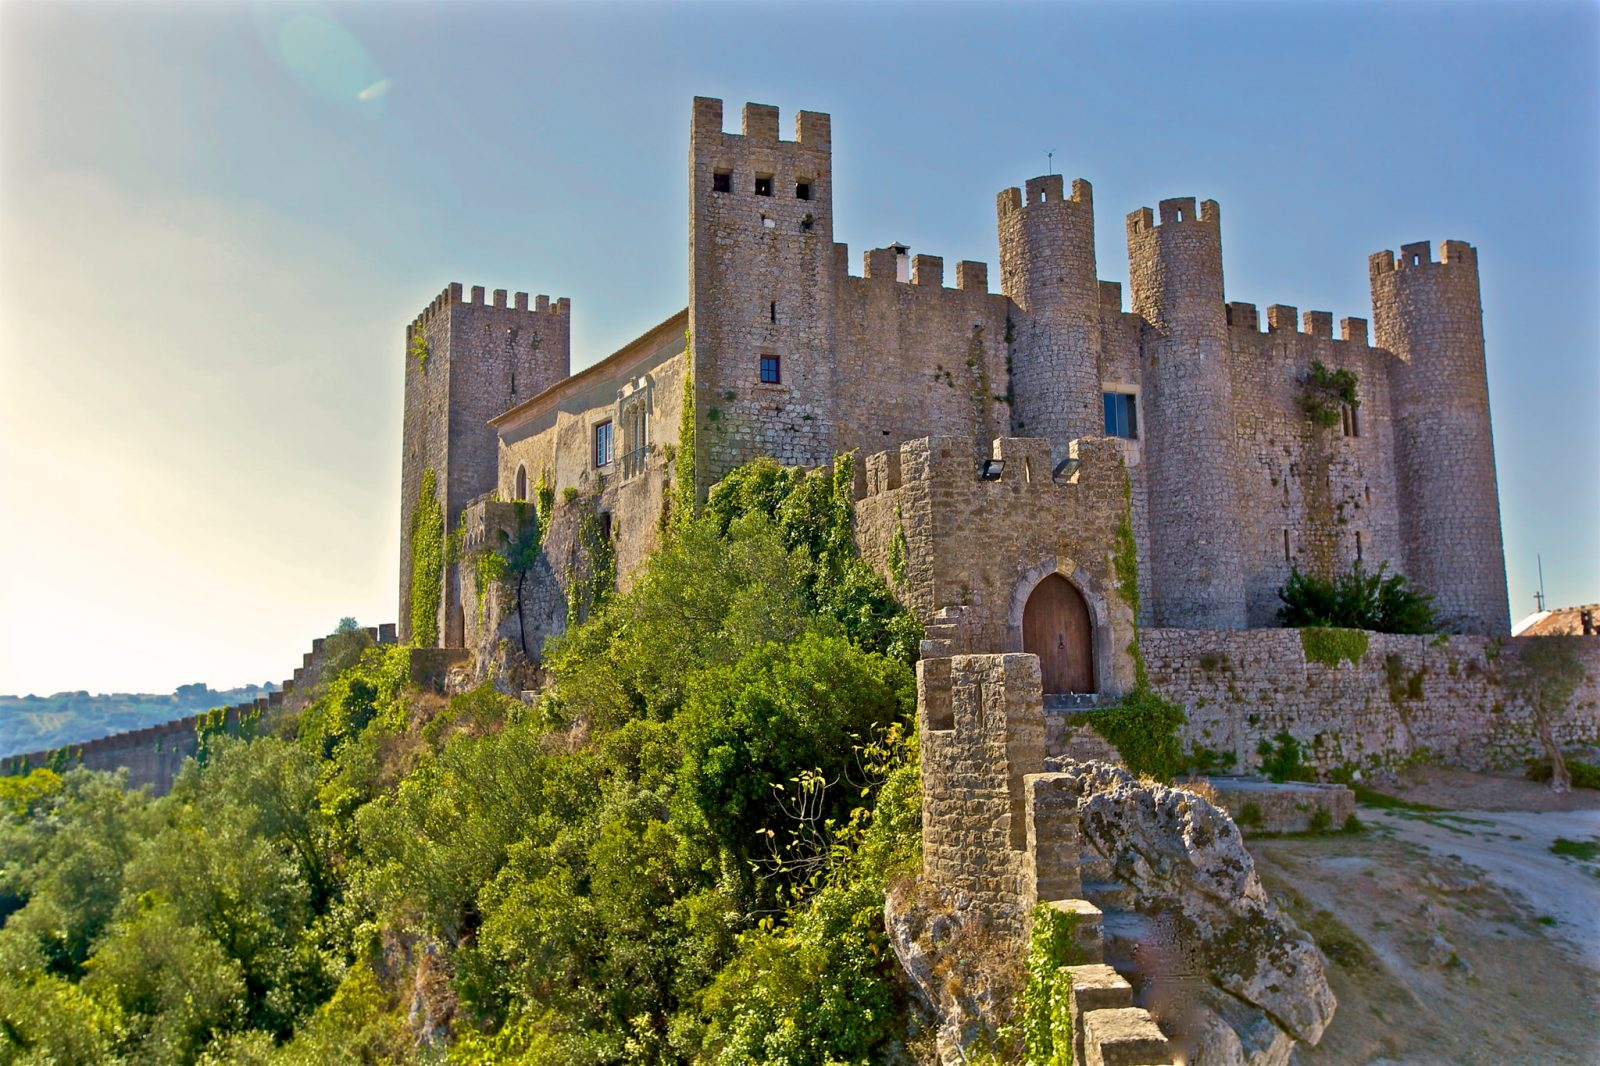 Замок Обидуш – «город Королев» (фото: Francisco Aragão)